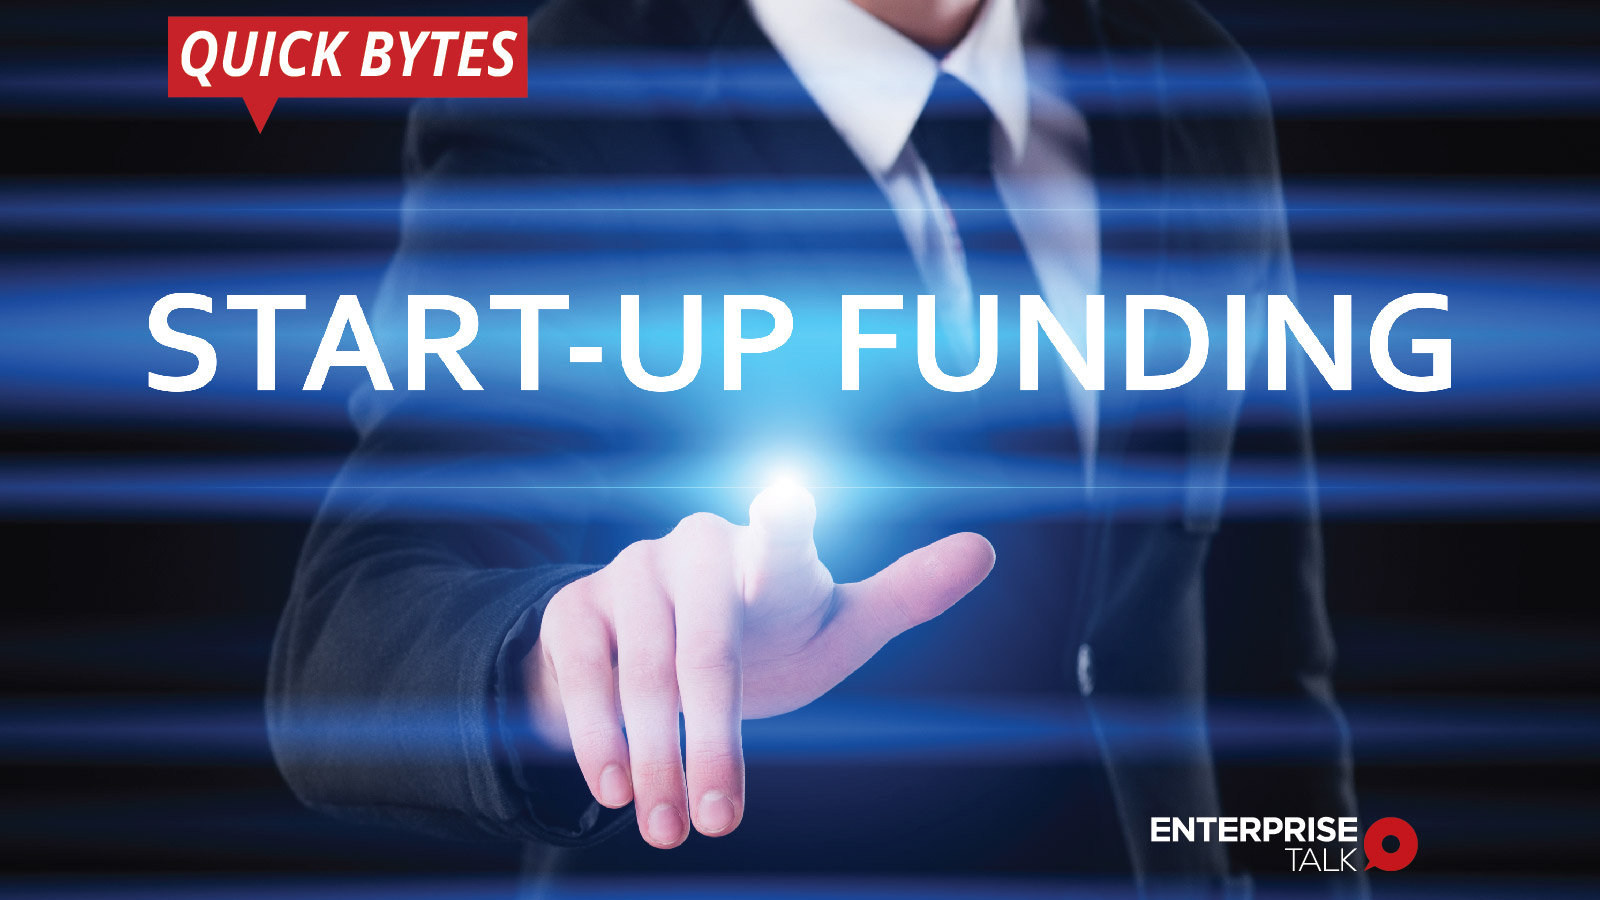 Europe, VC, venture capital, technology, start-ups